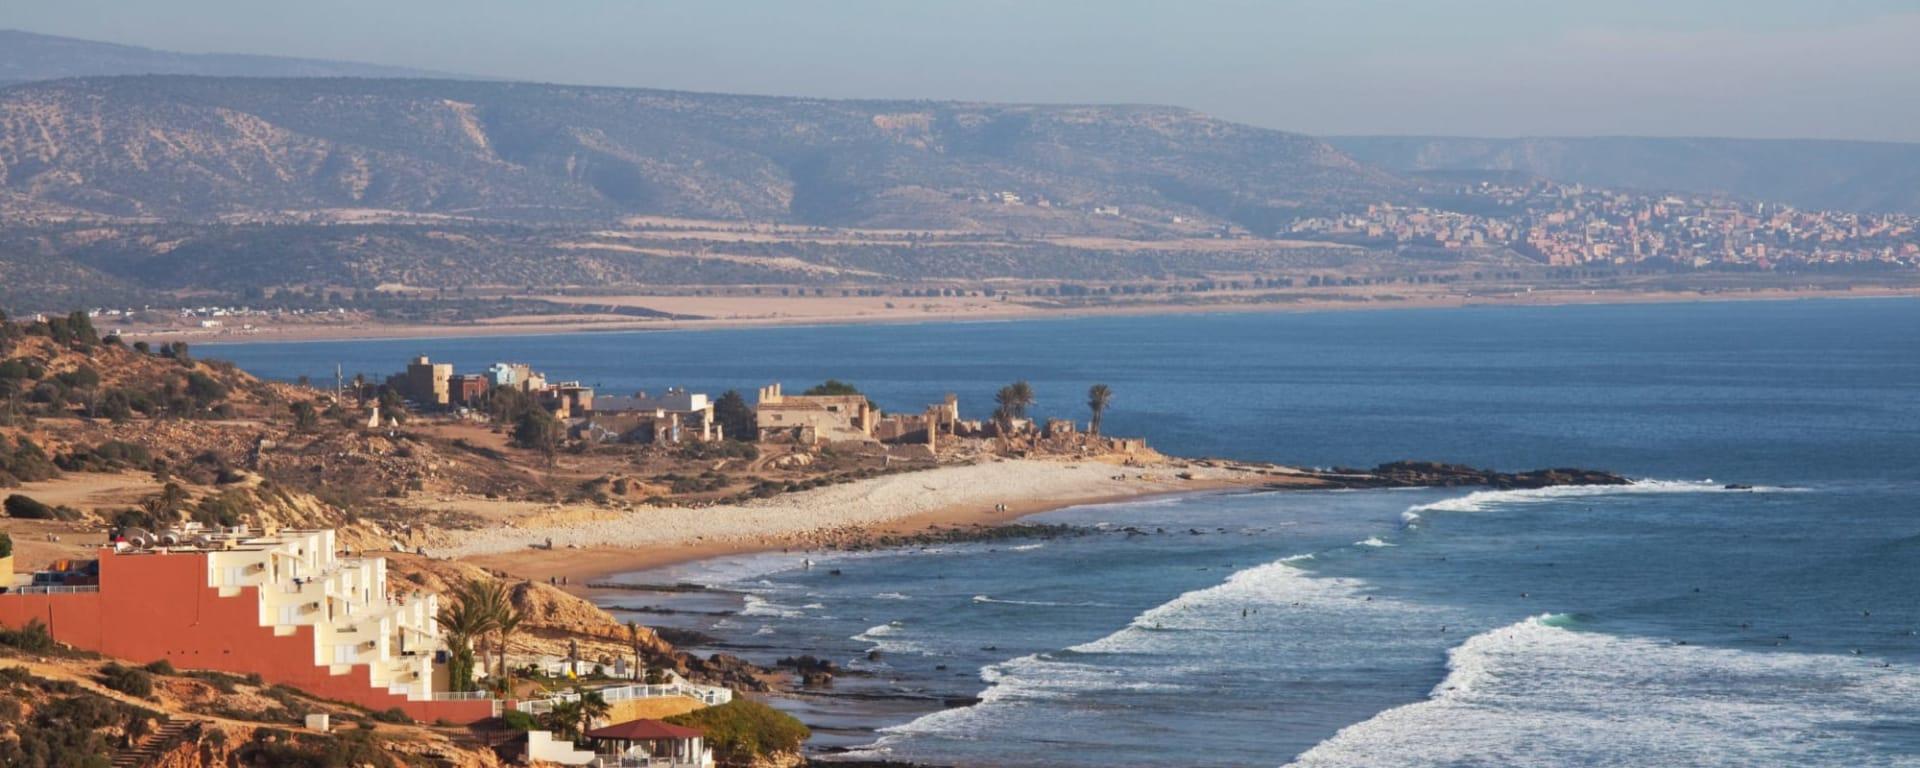 Stadtrundfahrt Agadir, EN, Halbtägig in Agadir   Taghazout: Agadir